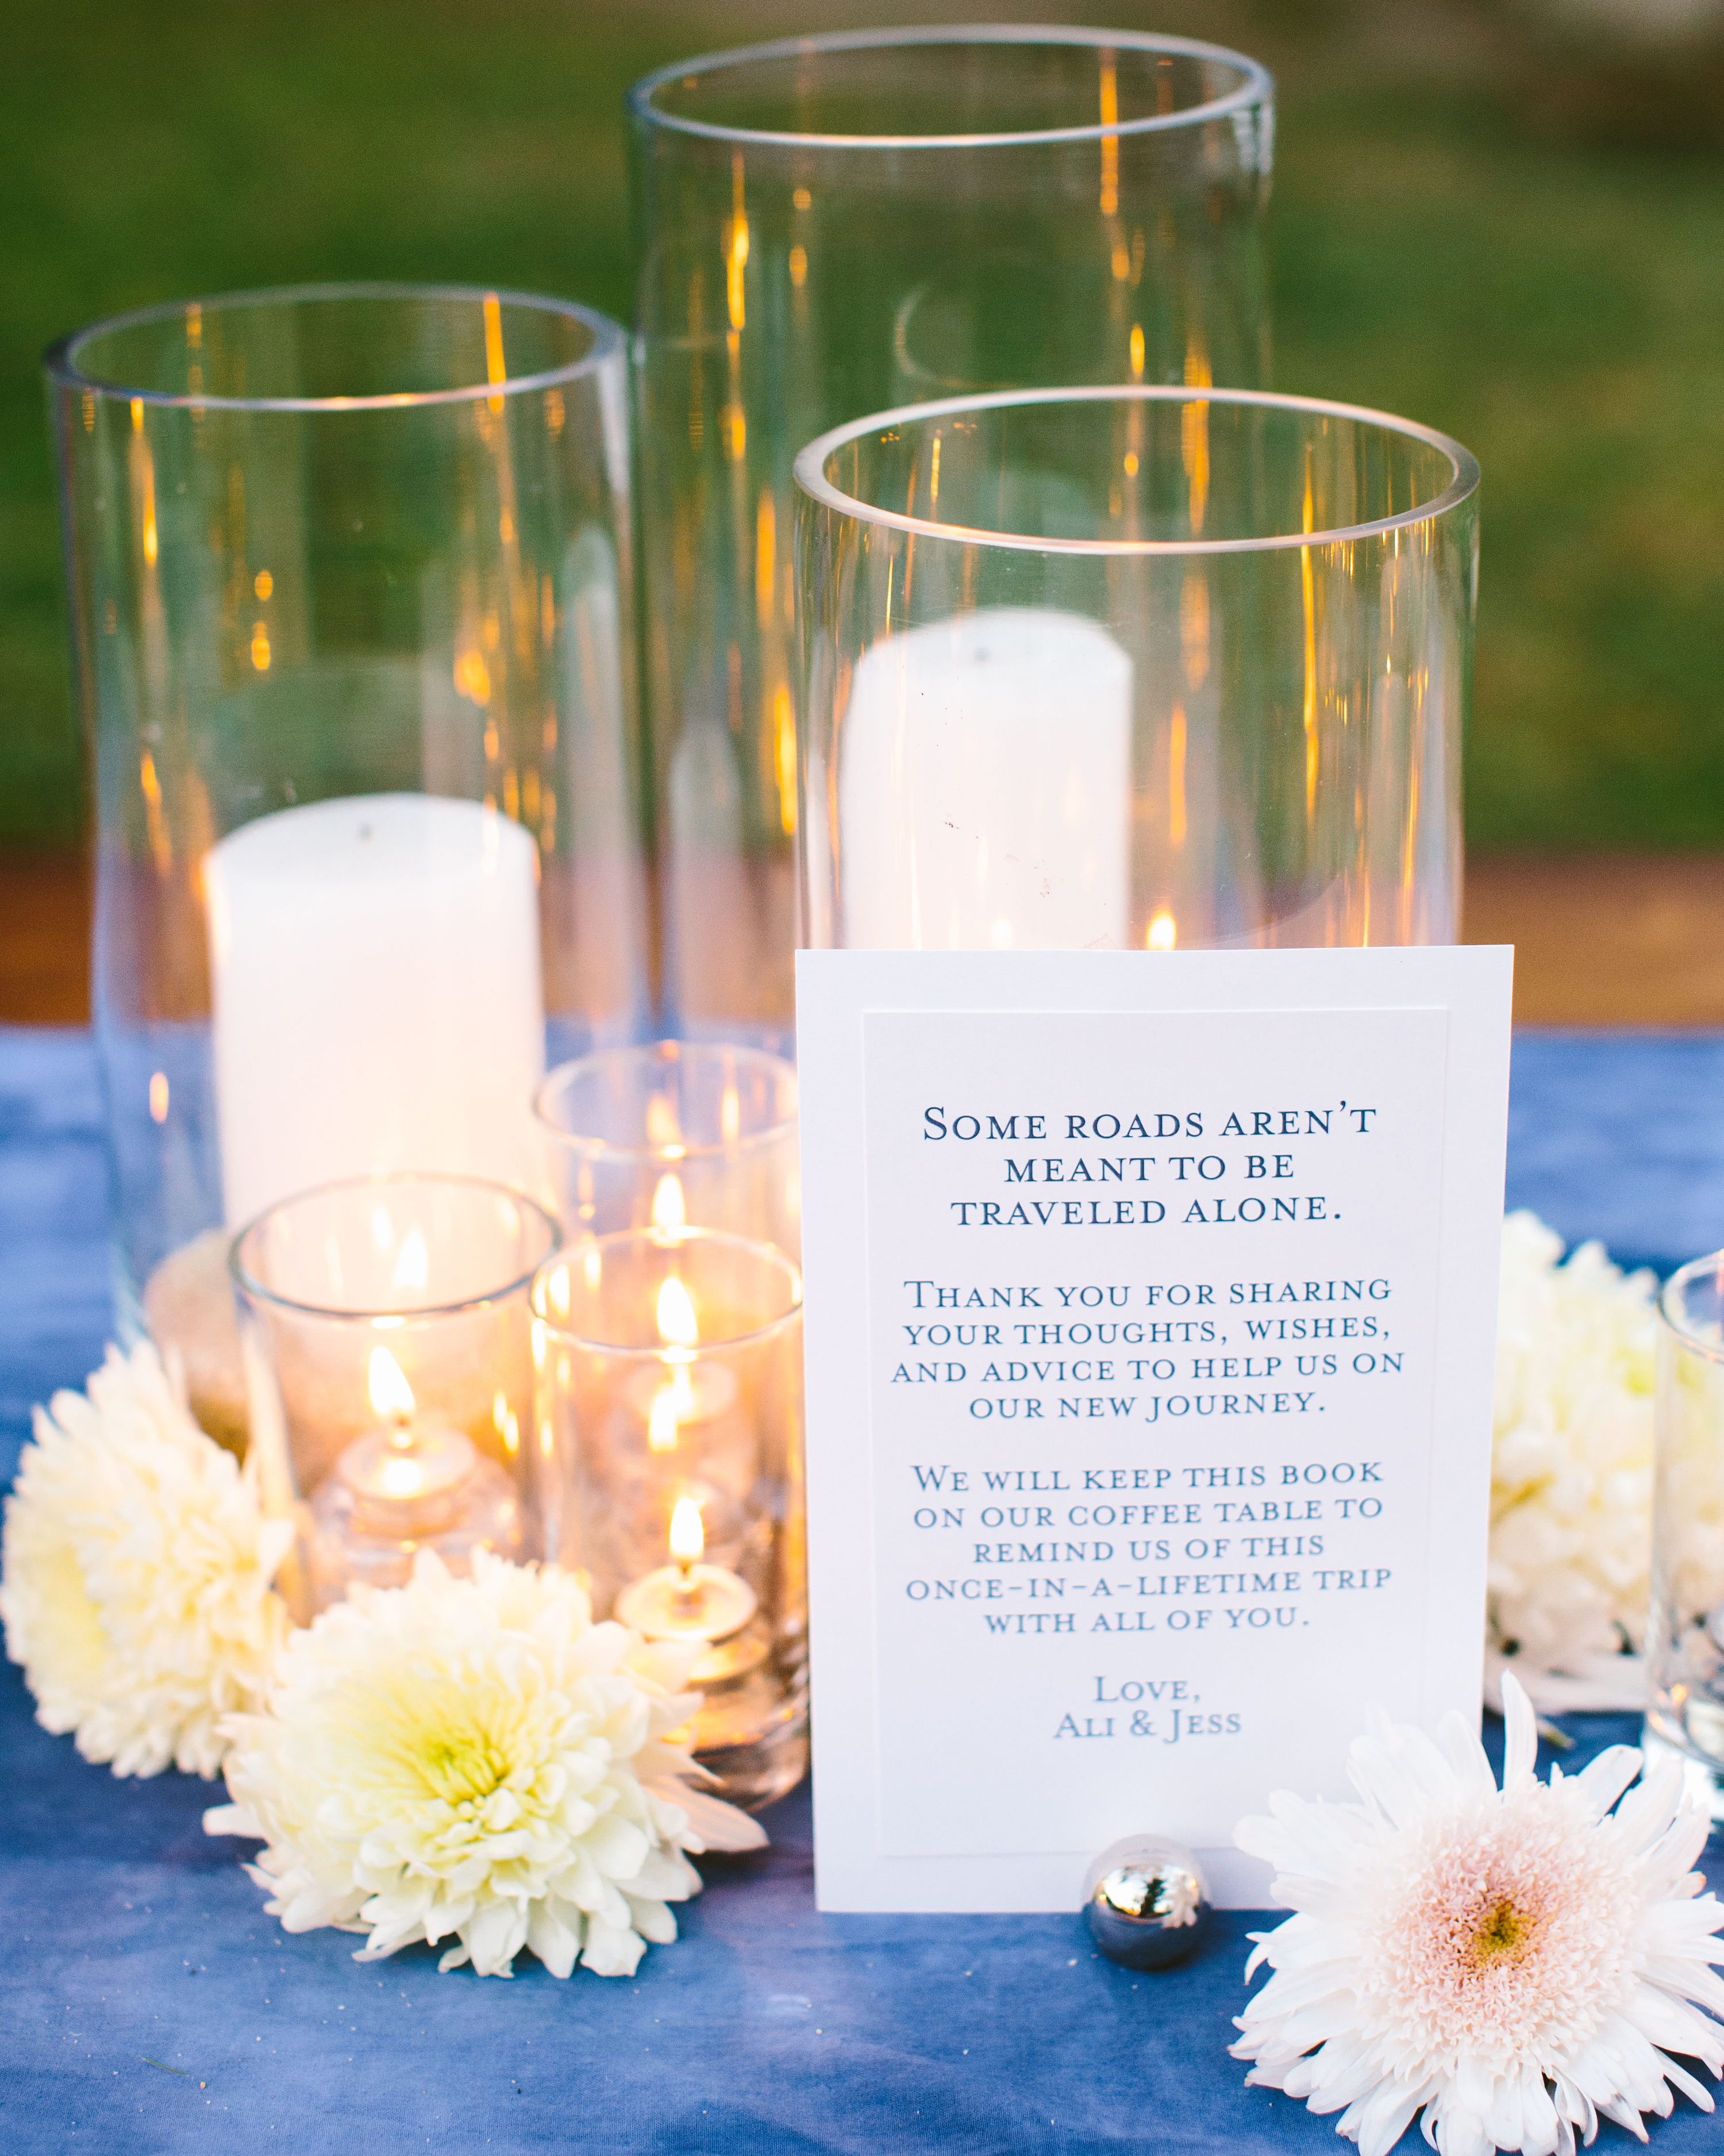 ali-jess-wedding-advice-033-002-s111717-1214.jpg